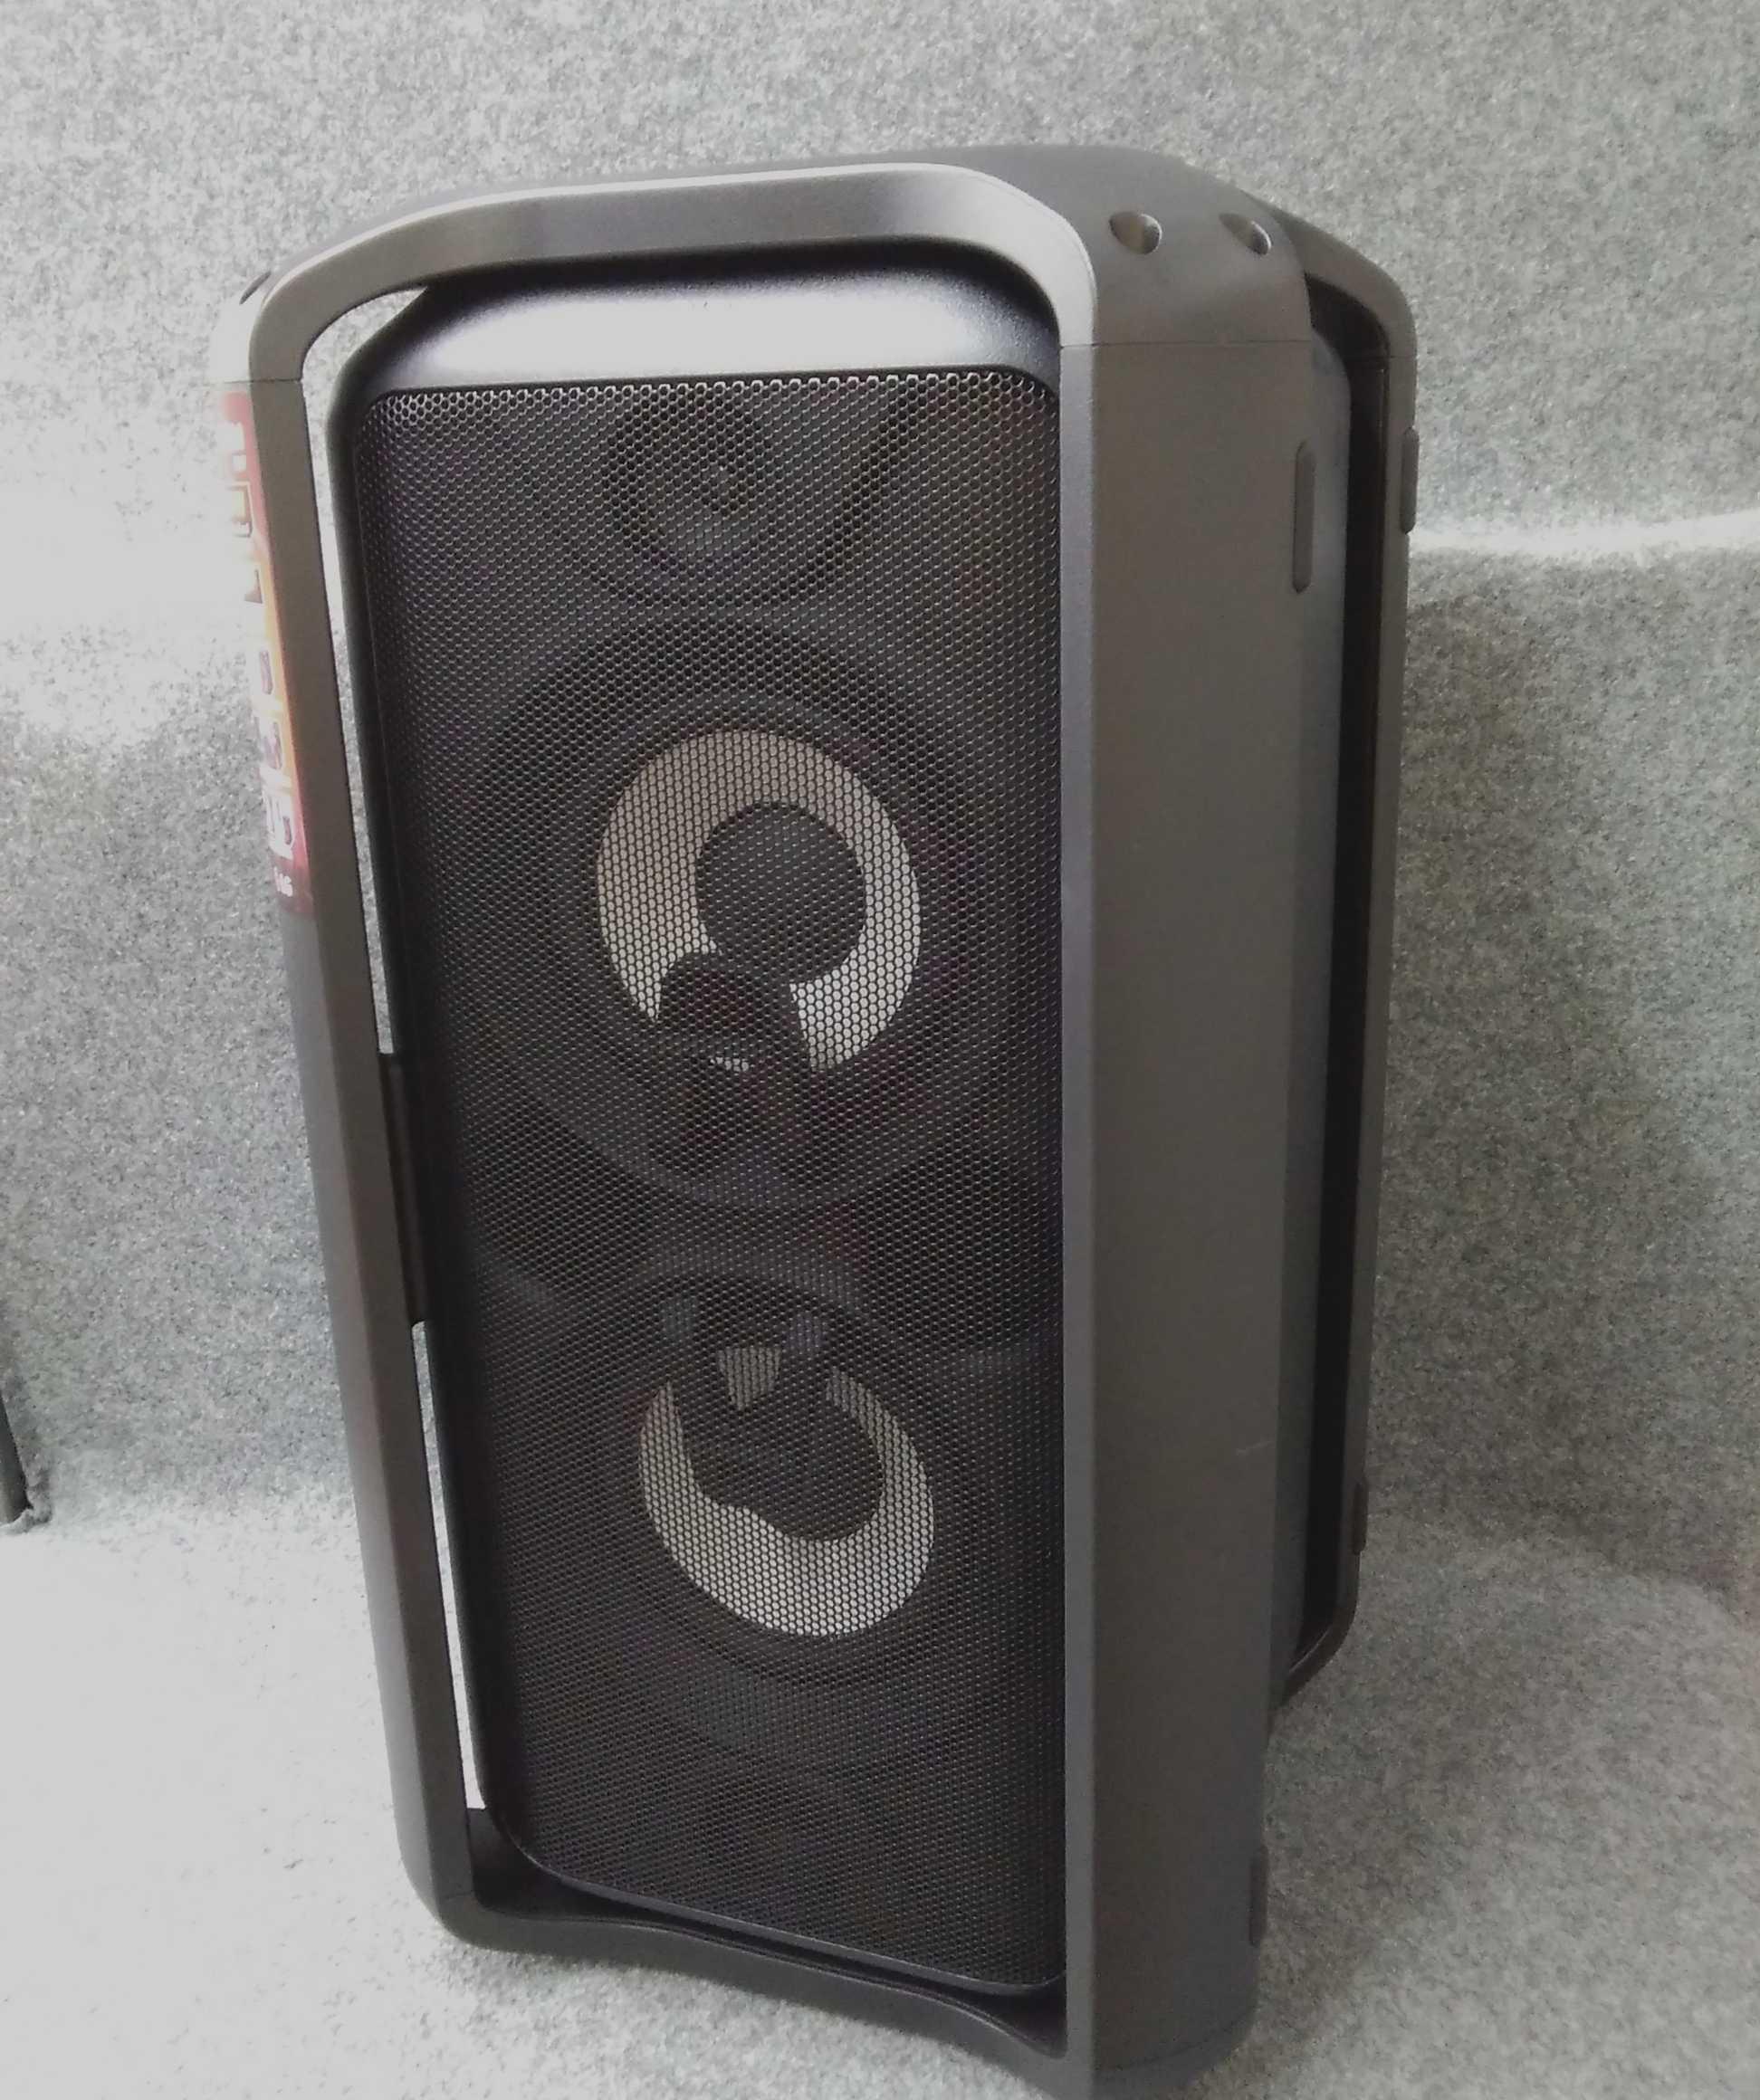 Bluetoothスピーカーシステム|LG